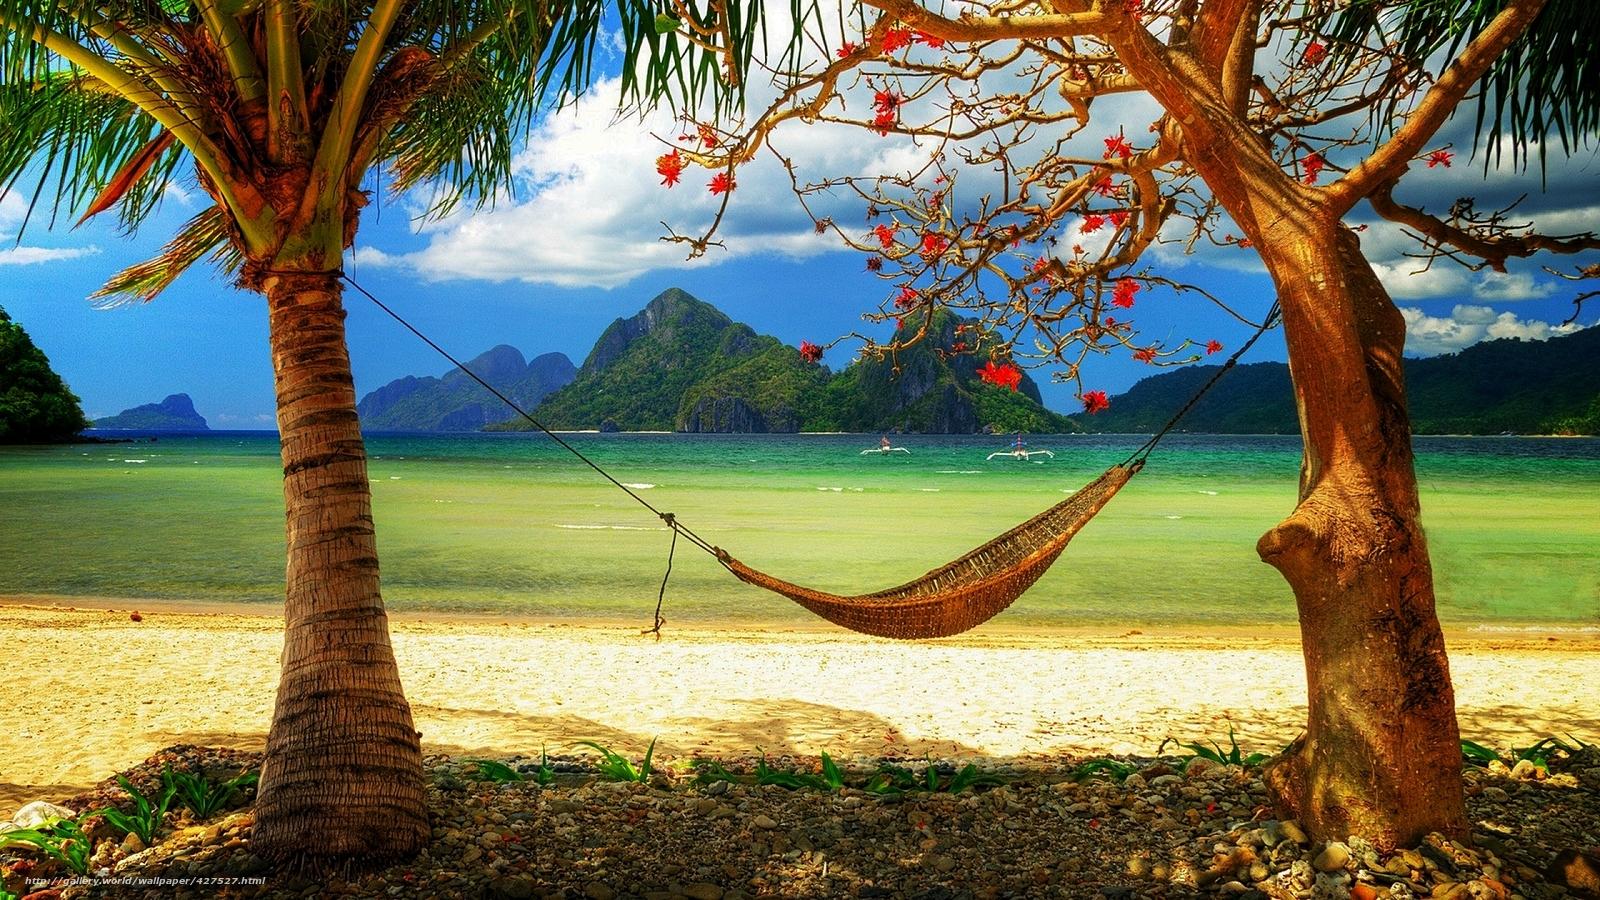 caribbean beach desktop backgrounds Car Tuning 1600x900